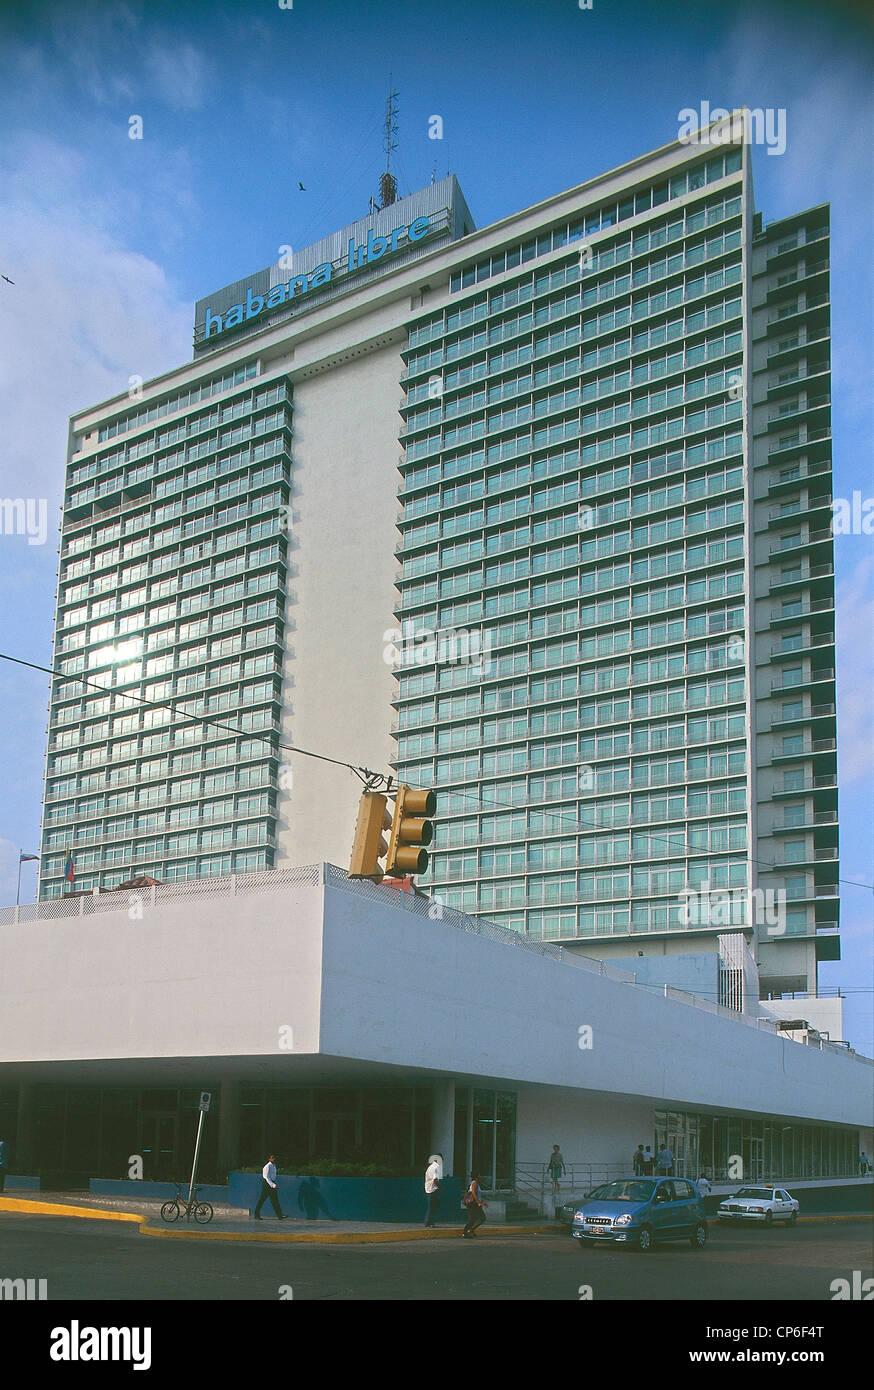 Cuba - La Havane (La Habana) - Vedado. Hôtel Habana Libre, l'ancien Hilton de La Havane. Photo Stock